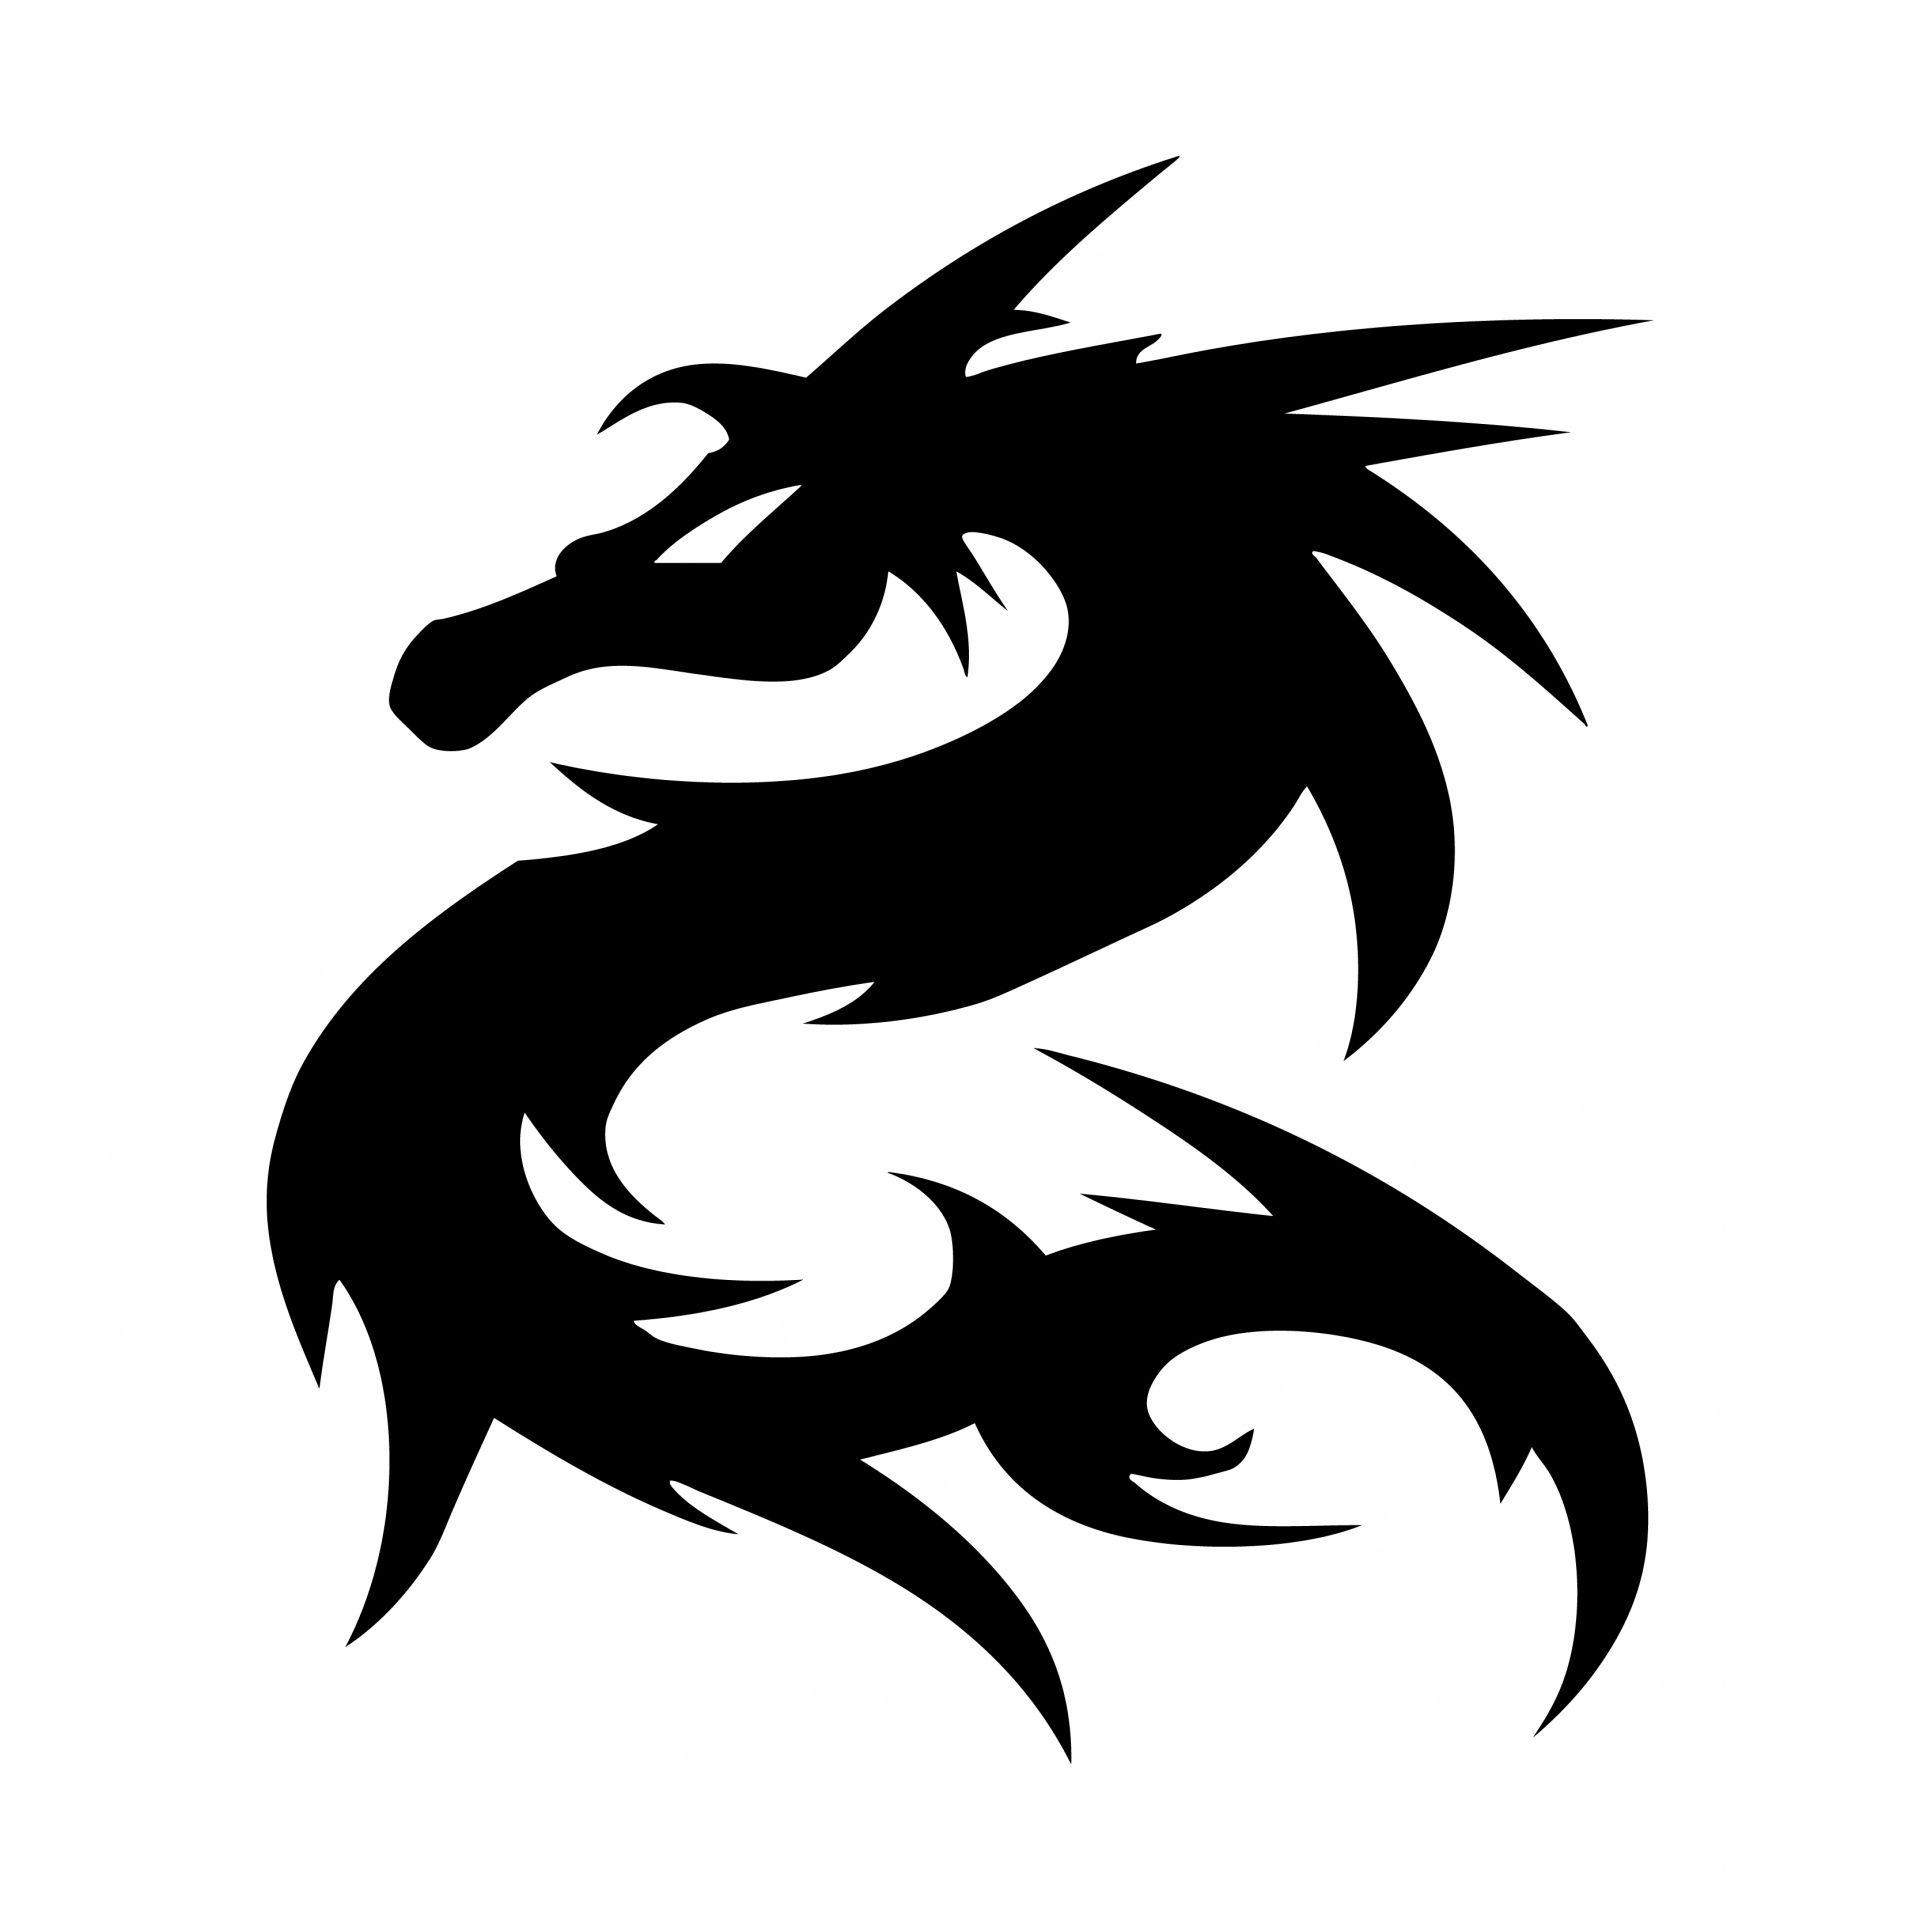 image result for dragon logo